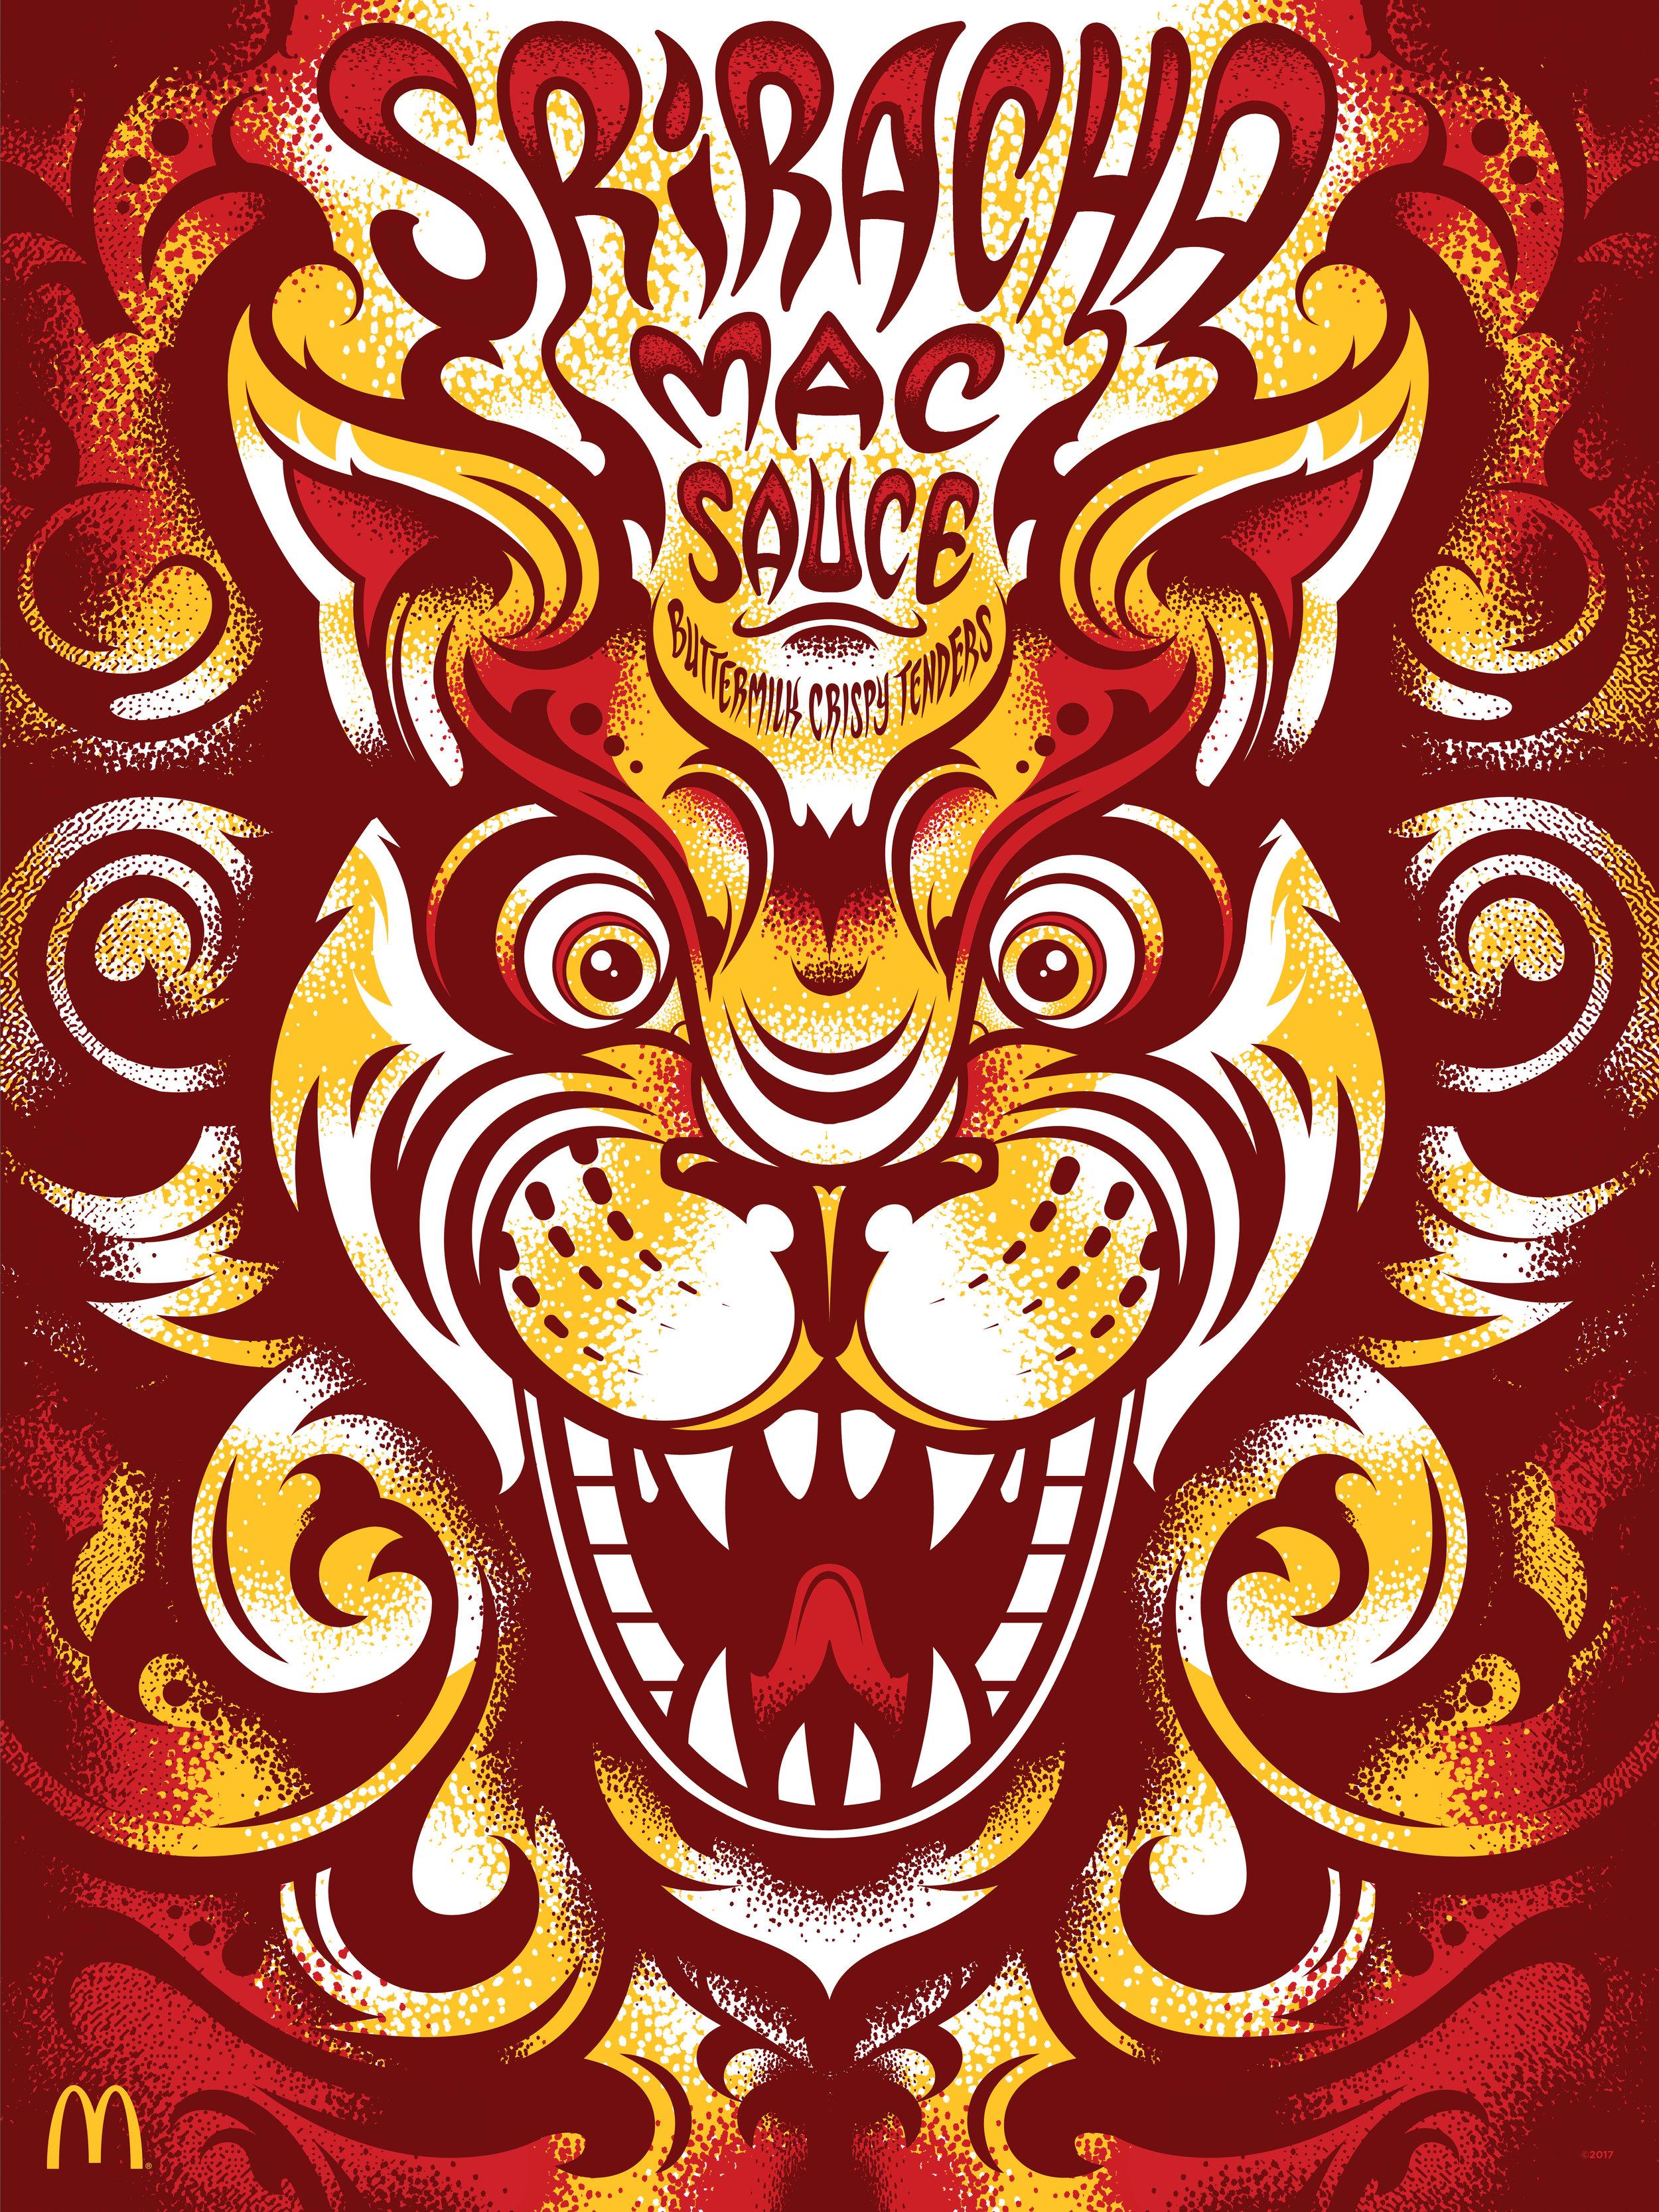 SrirachaMacSauce-01.jpg